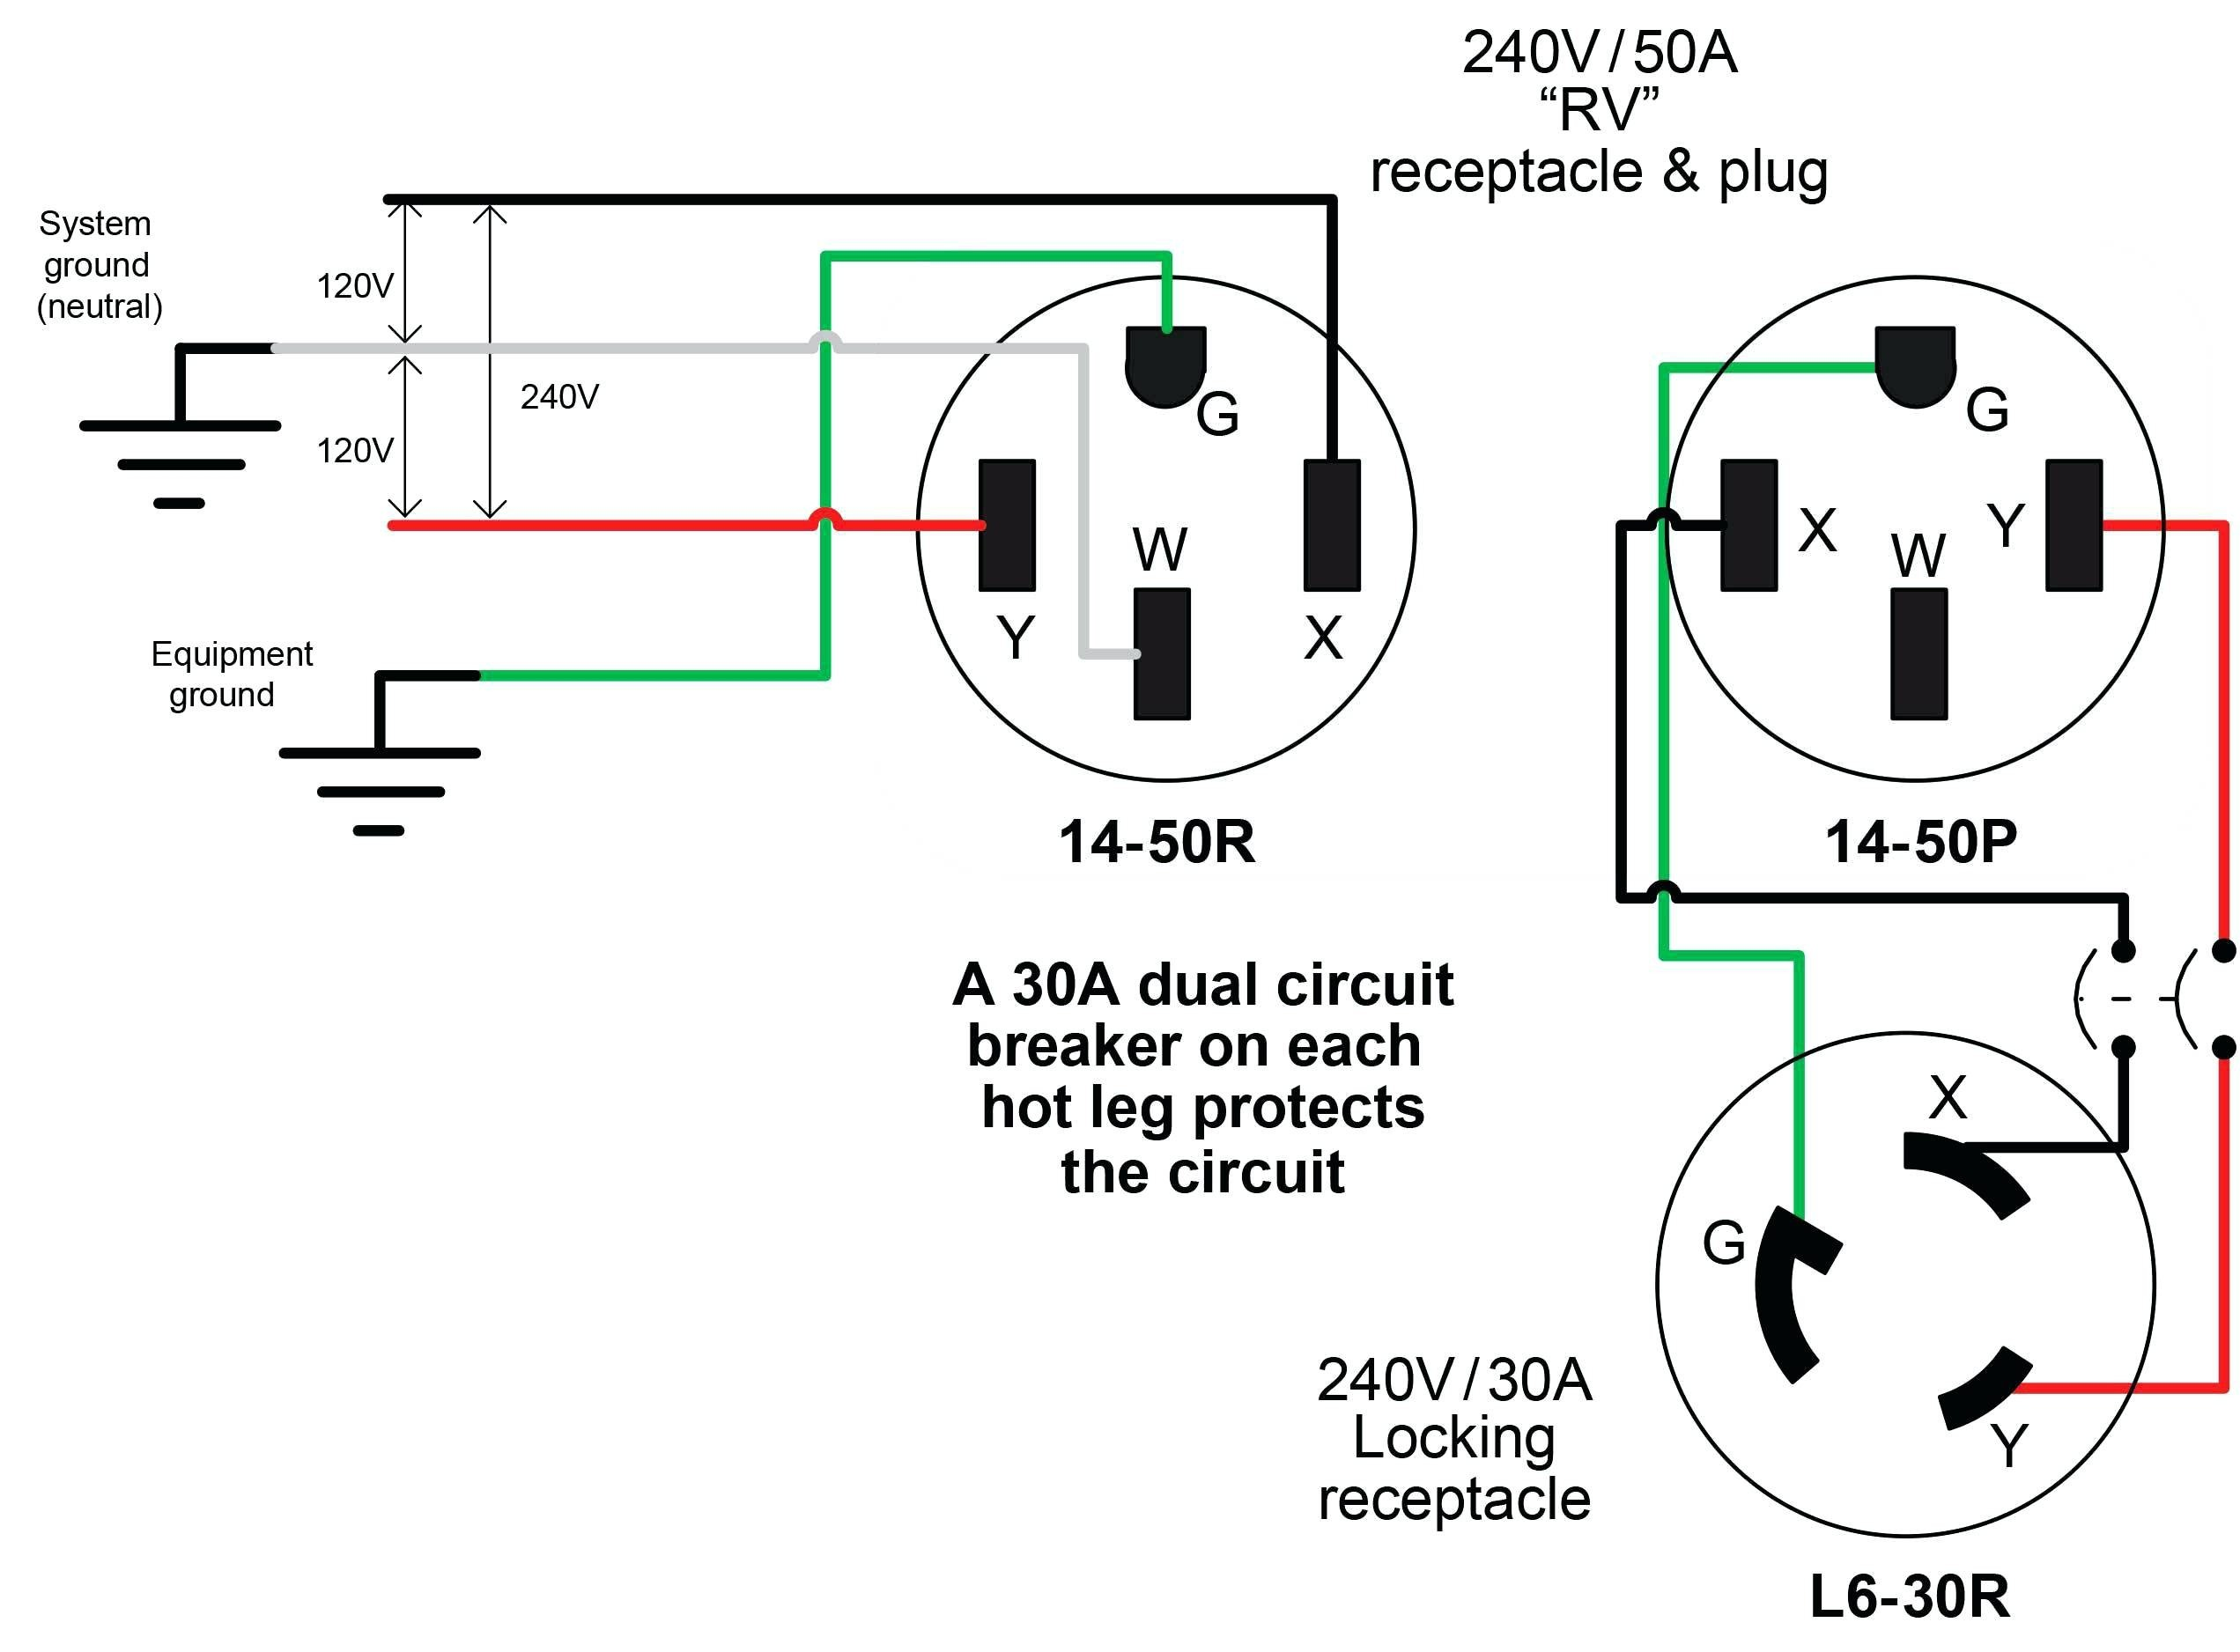 AD_8194] Nema 14 50R Wiring Diagram Free Download Wiring Diagram Schematic  Download DiagramIndi Xolia Mohammedshrine Librar Wiring 101